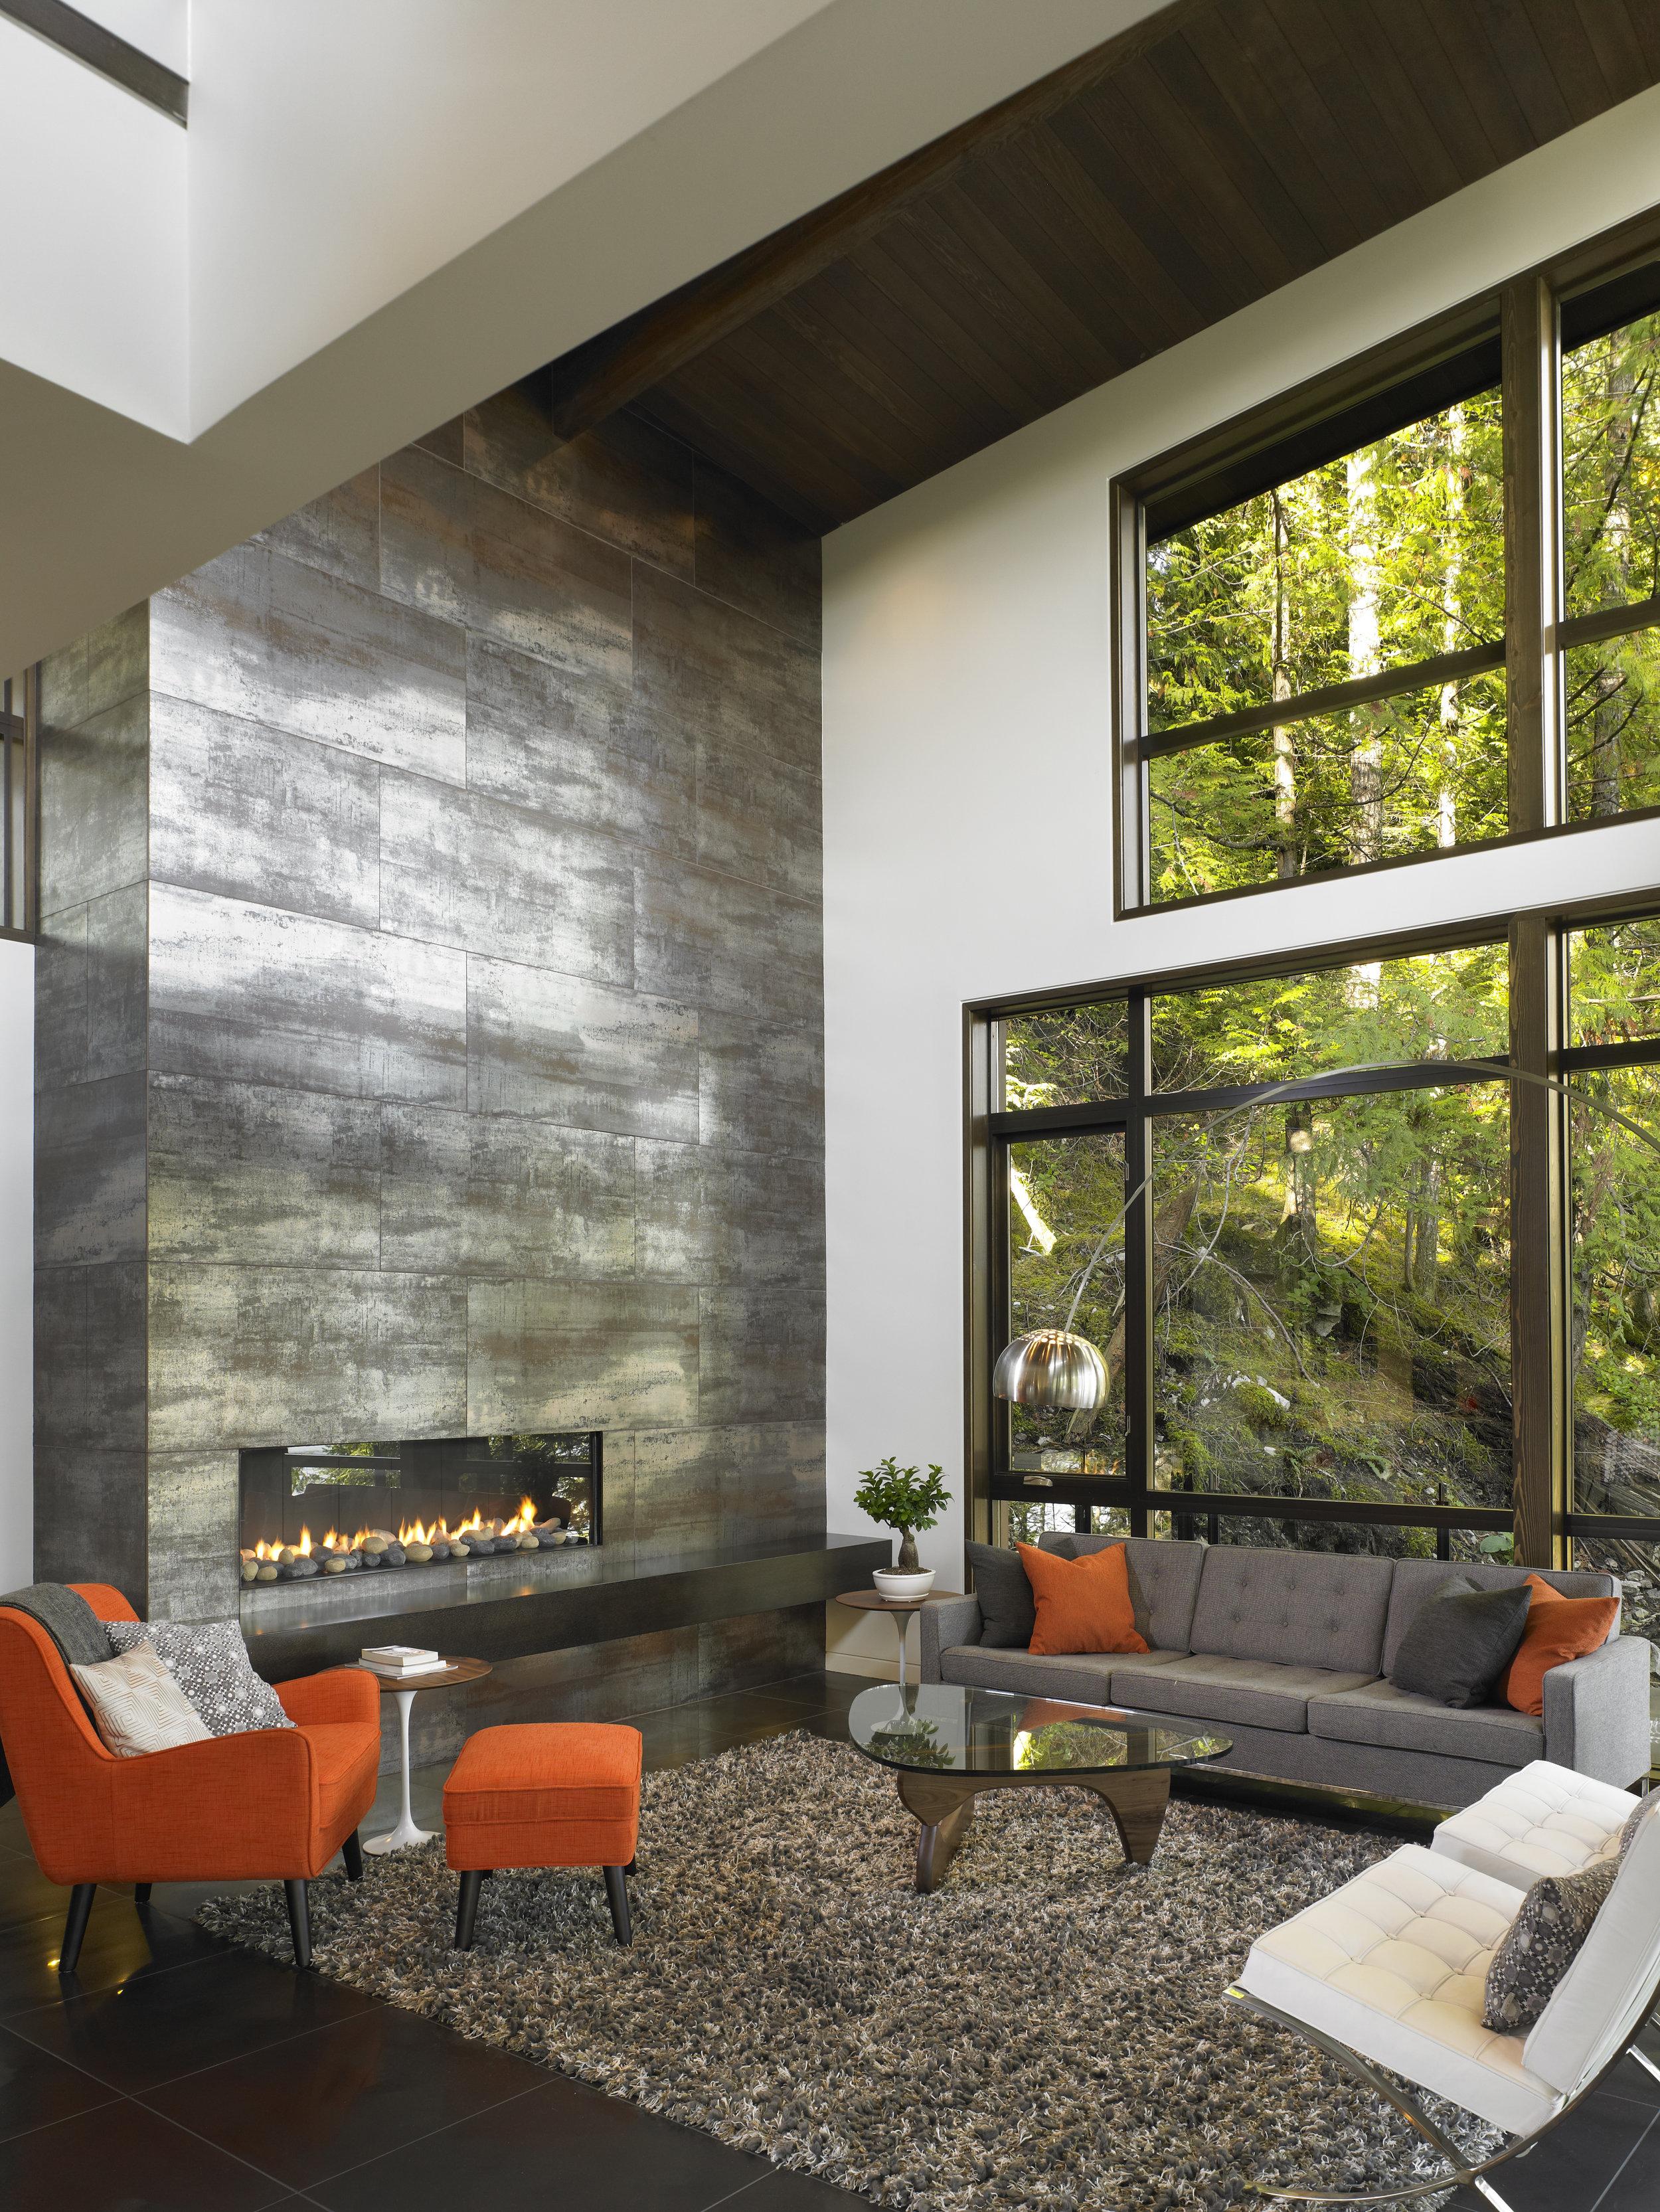 turkel_modern_design_prefab_gambier_island_house_living_room_great_room.jpg